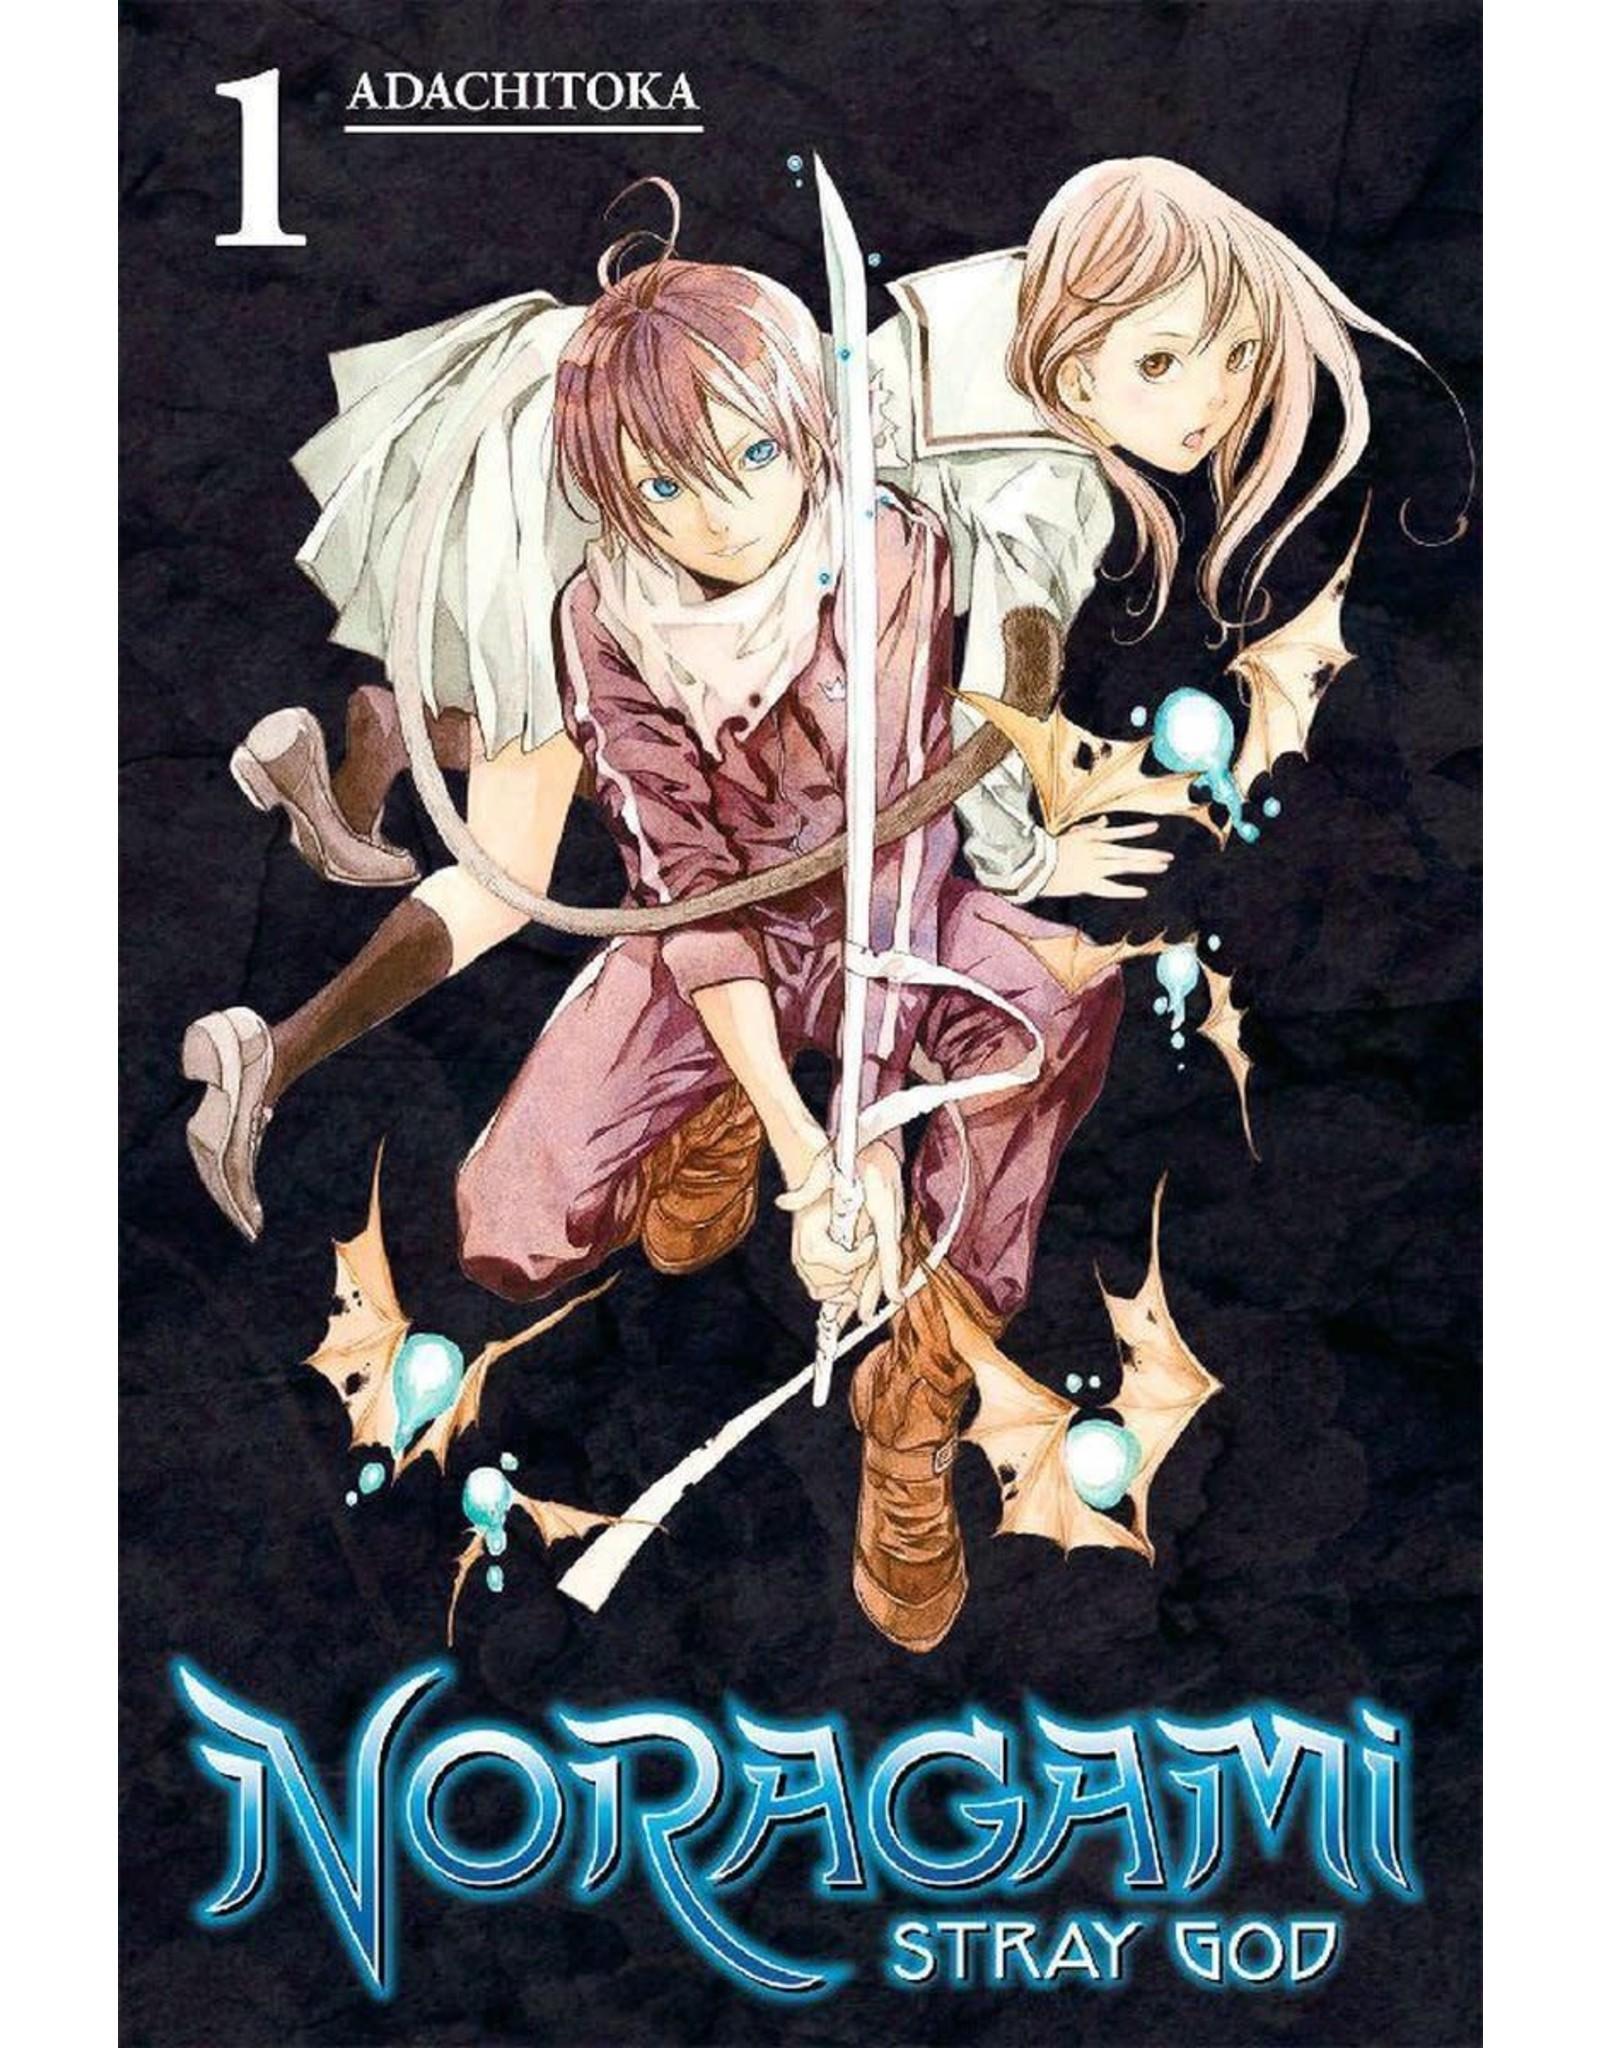 Noragami: Stray God 01 (Engelstalig) - Manga